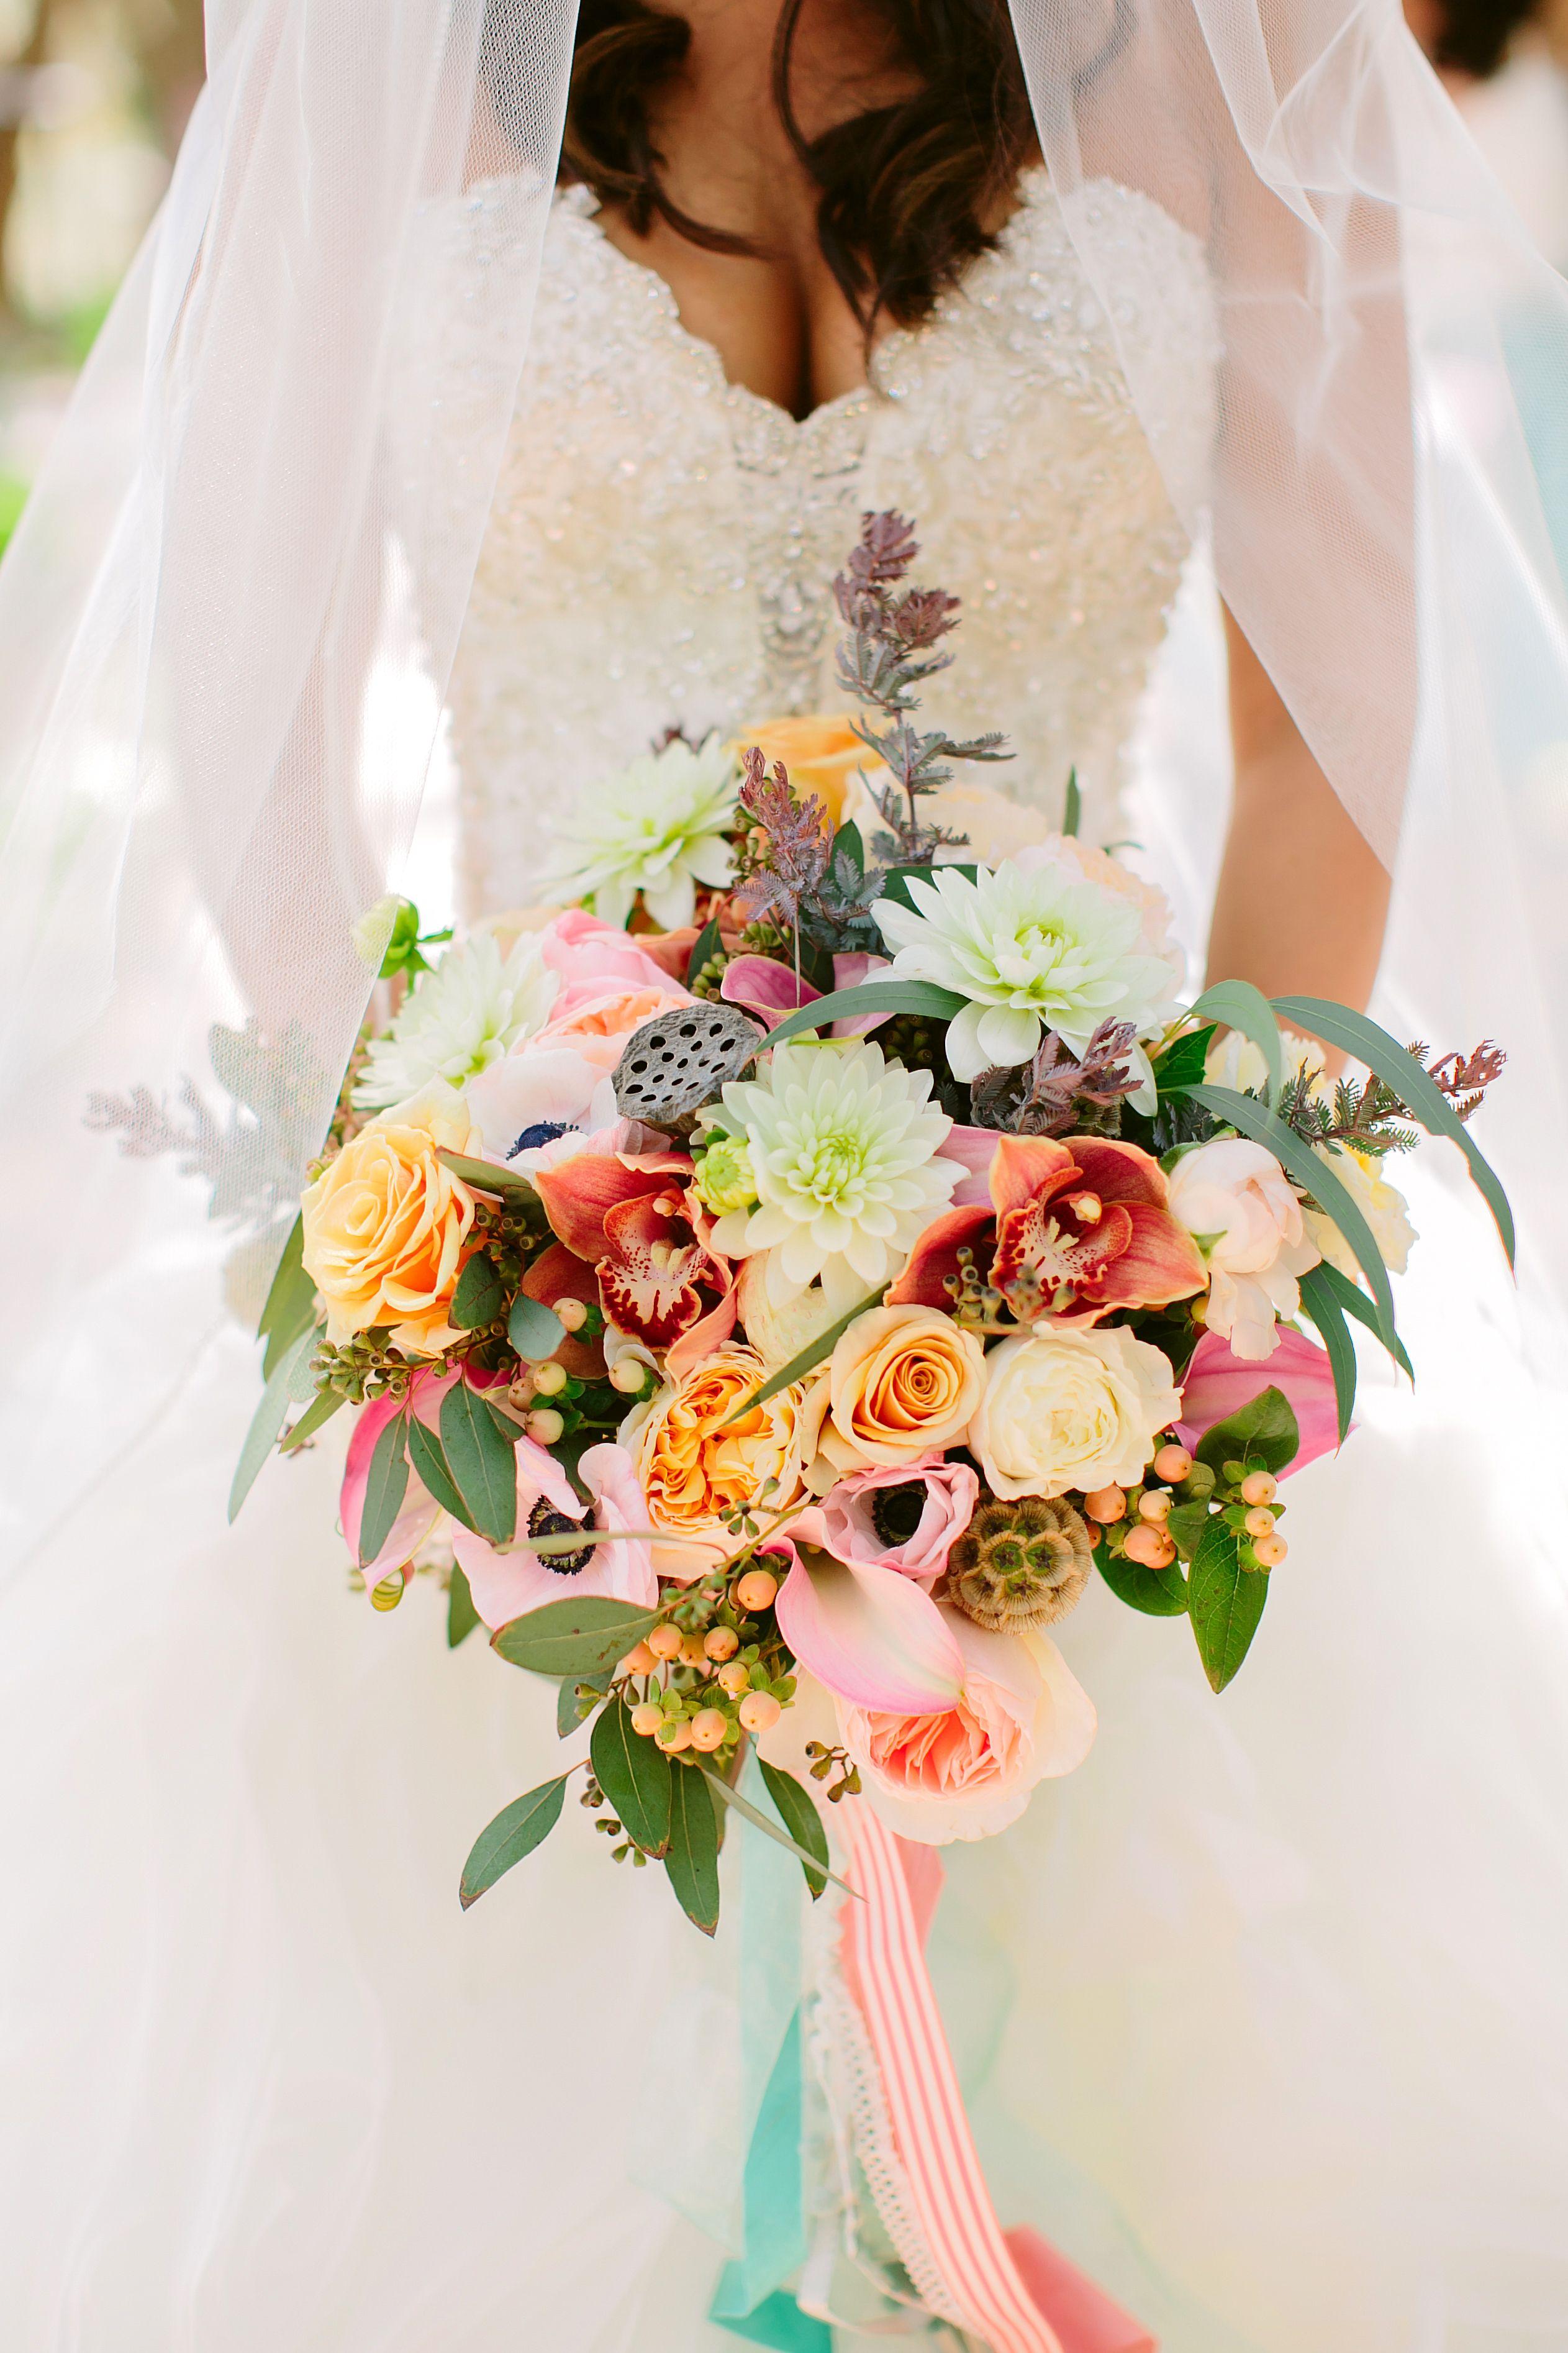 Colorful overflowing flower bouquet wedding plans pinterest colorful overflowing flower bouquet izmirmasajfo